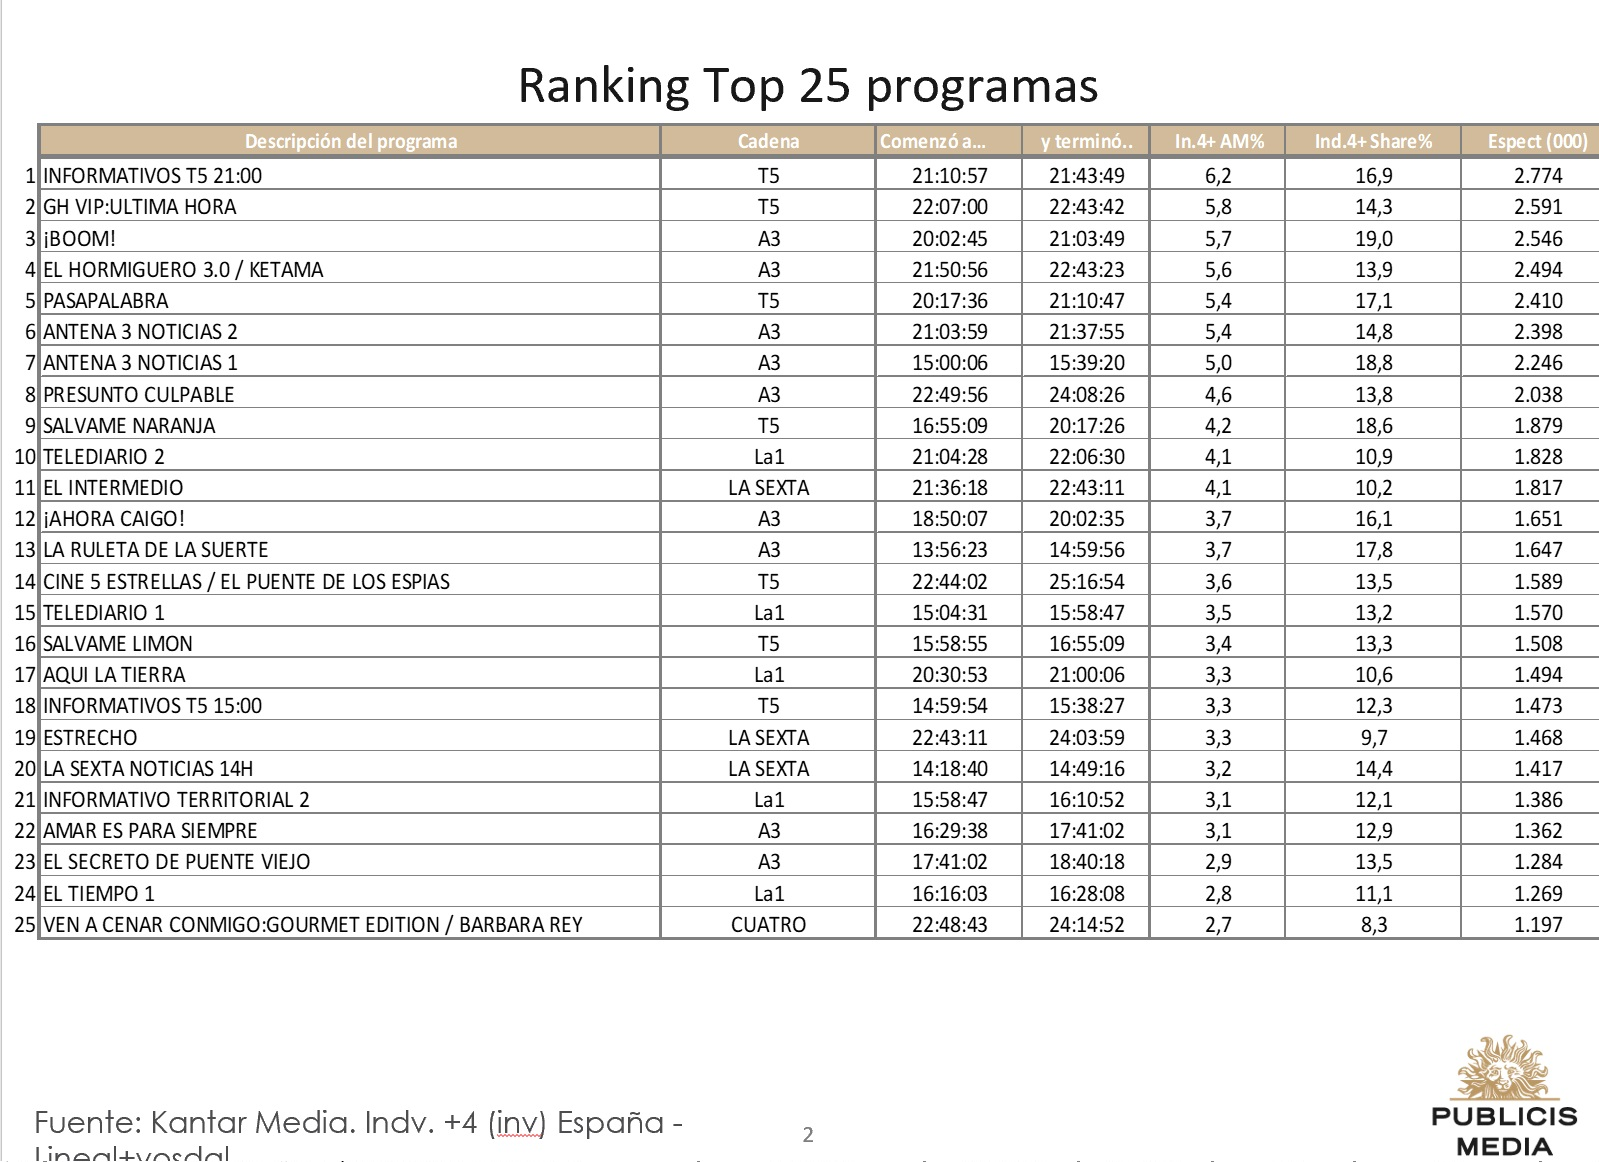 http://www.programapublicidad.com/wp-content/uploads/2018/12/Top-25-Publicis-media-4-dic-2018-programapublicidad-muy-grande-1.jpg